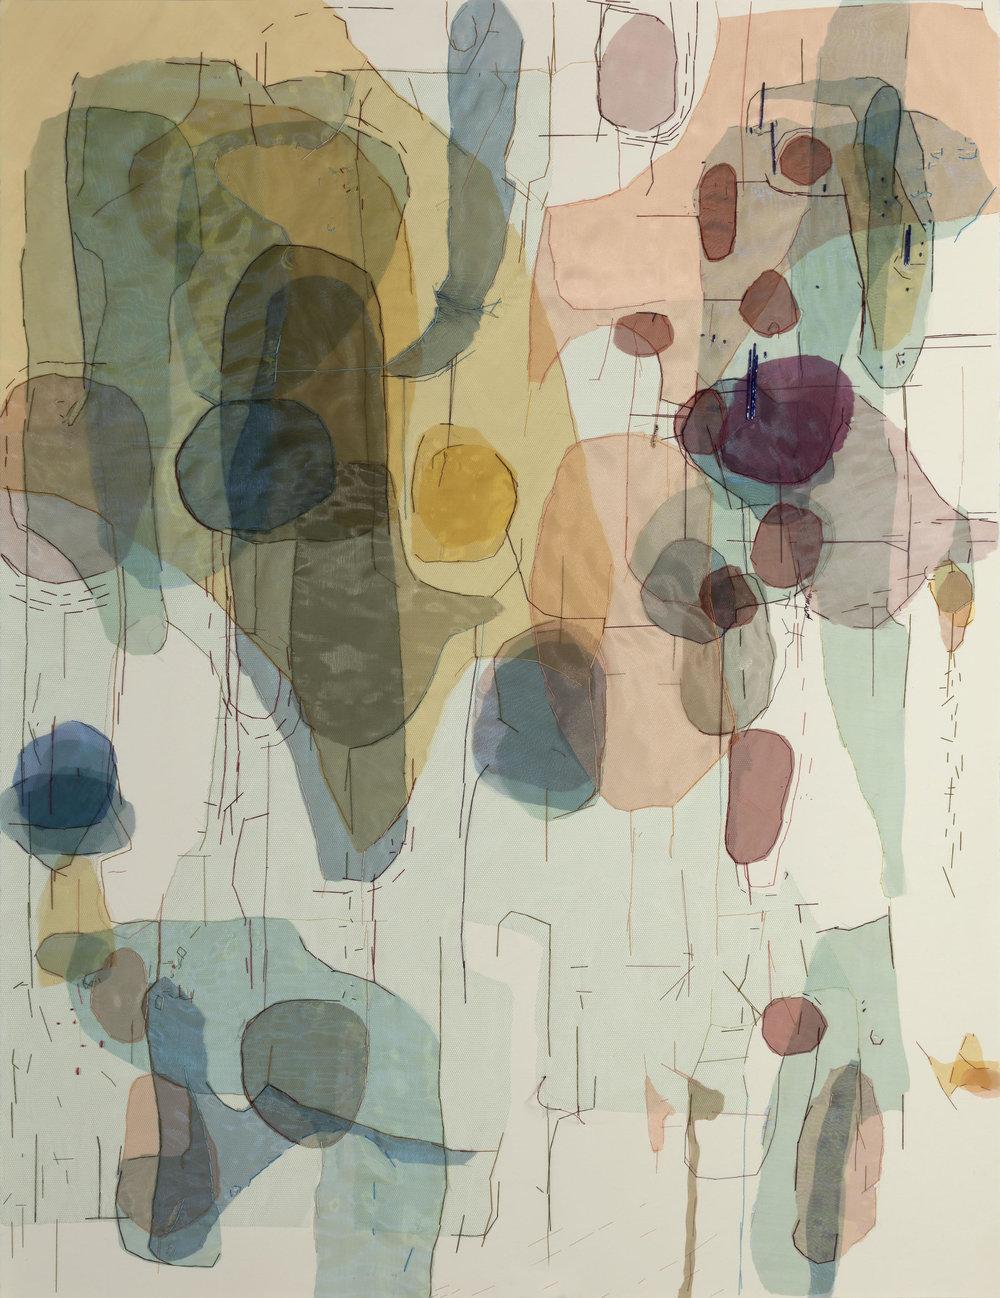 HEMATOMA GRANDE 3, 2018 Bordado sobre papel 110 x 75 cm. 43.5 x 29.5 in.